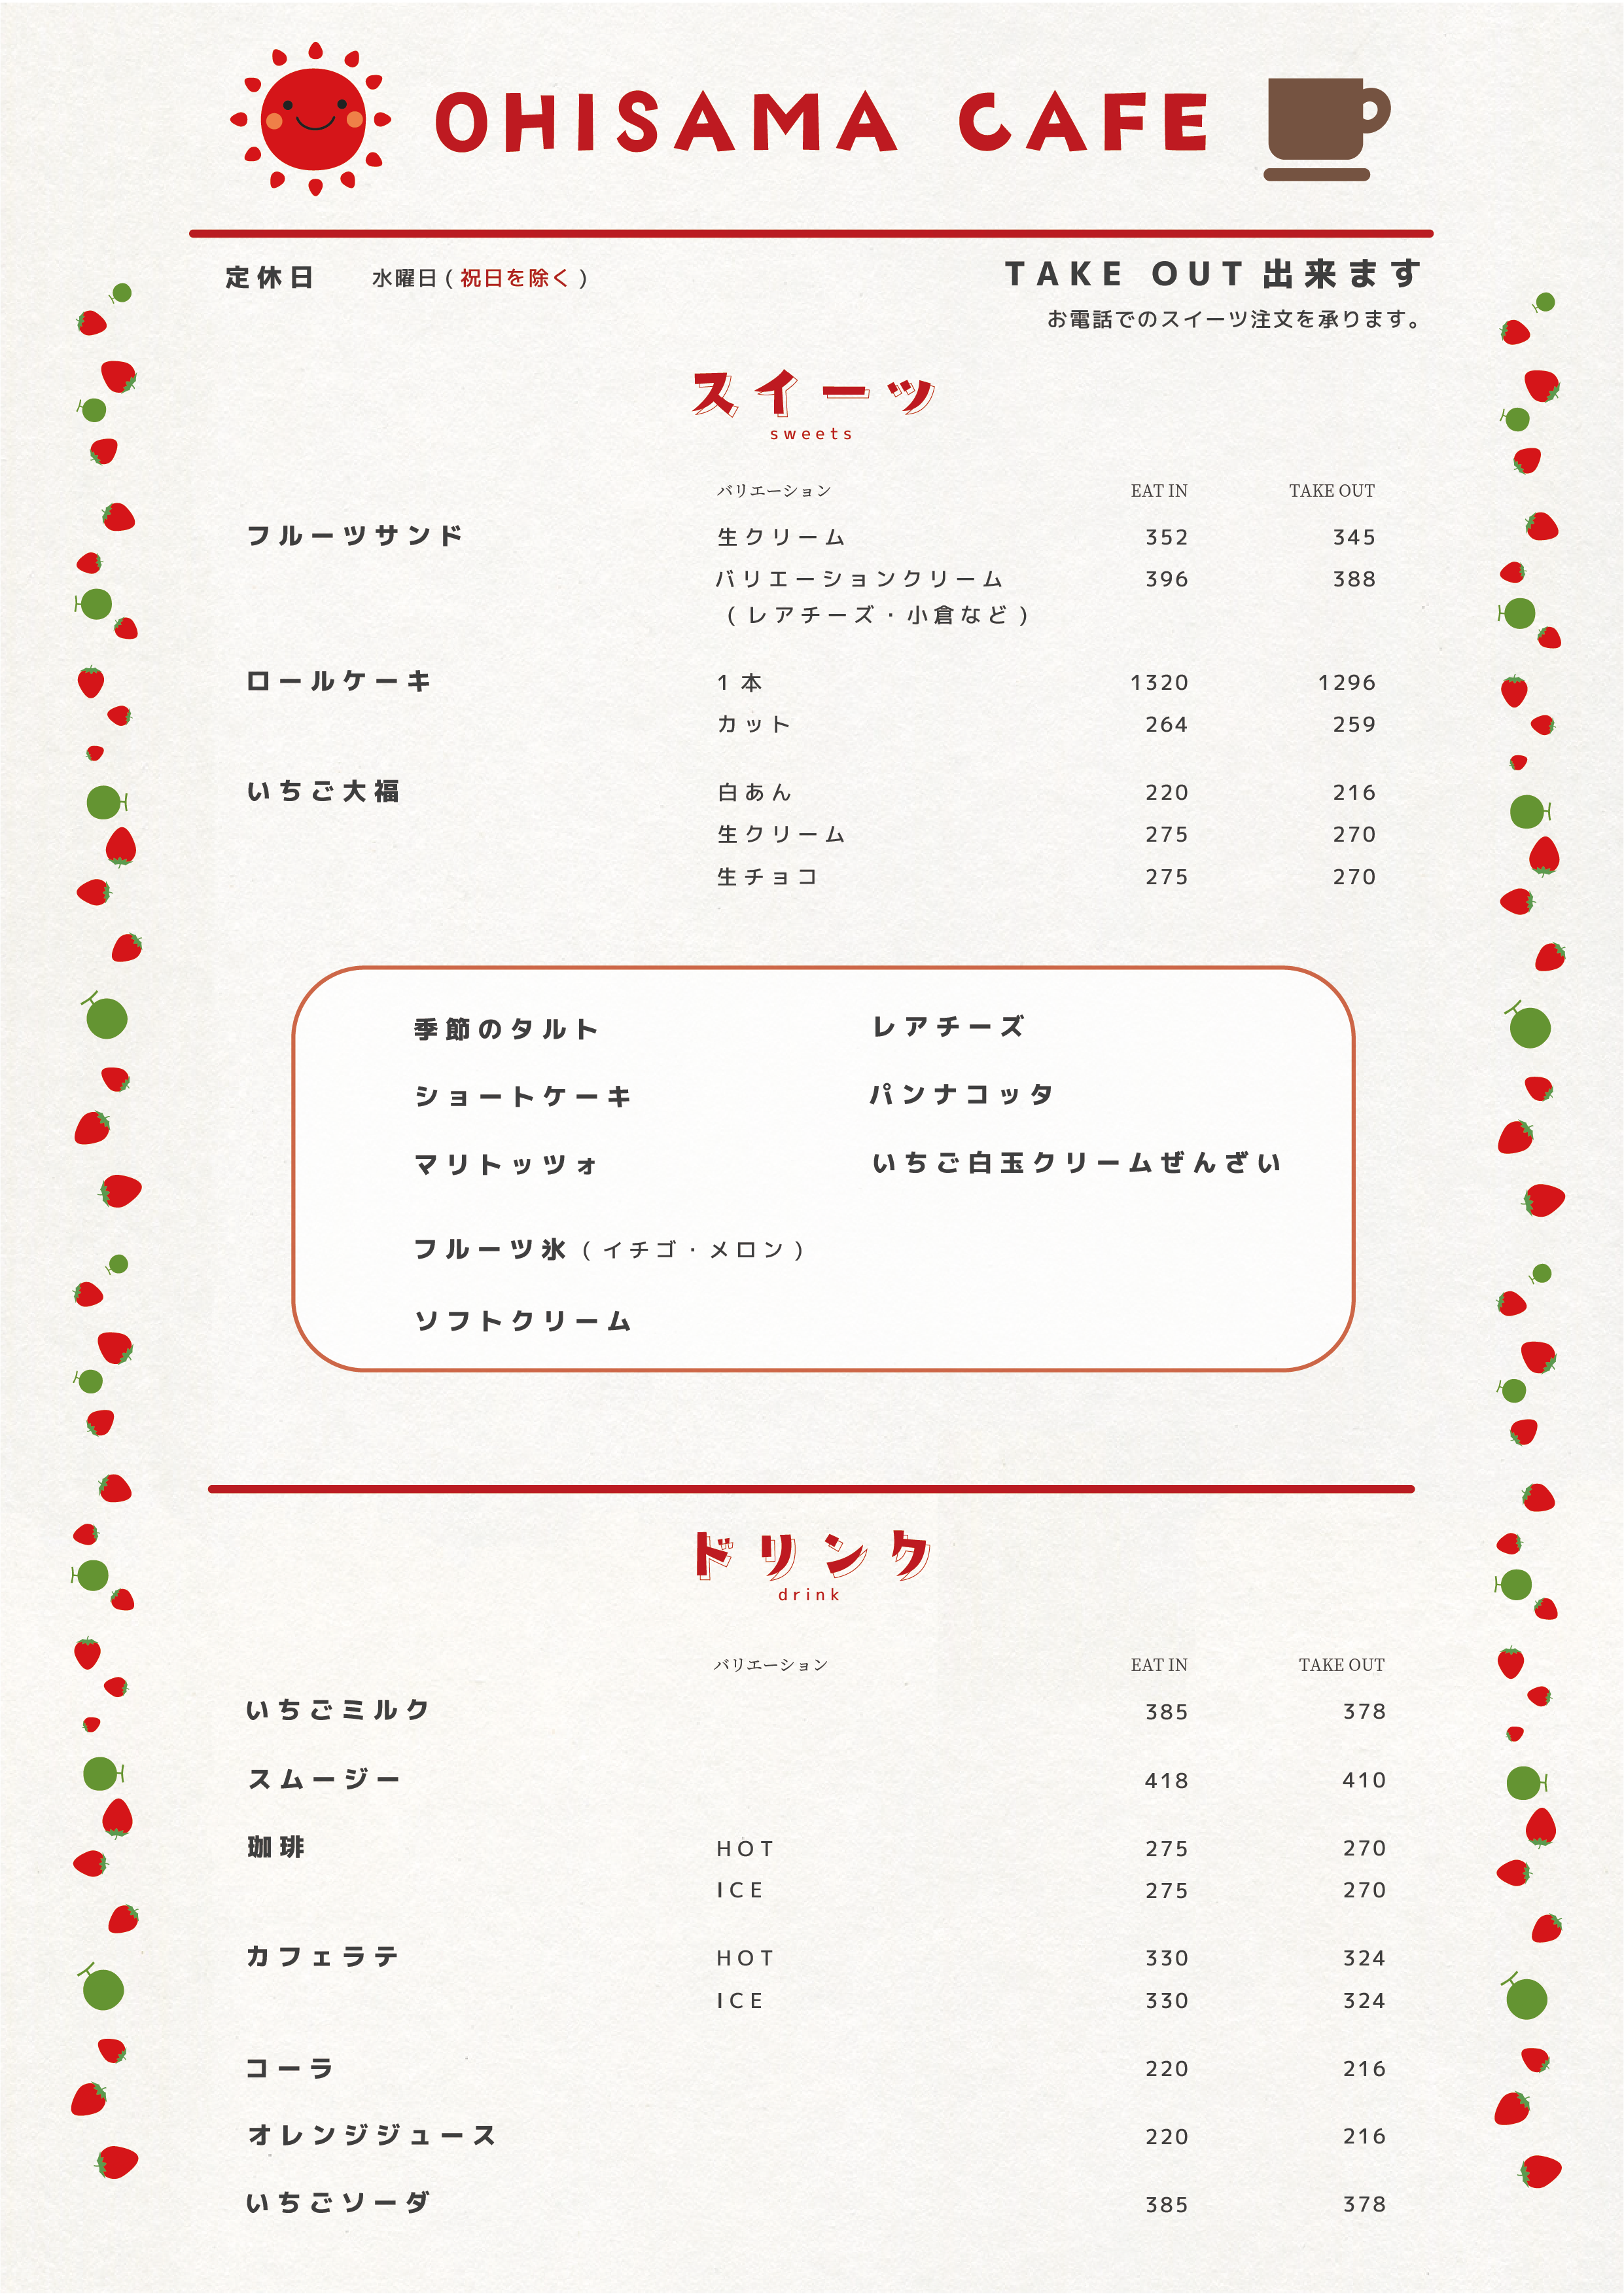 ohisamacafeメニュー表